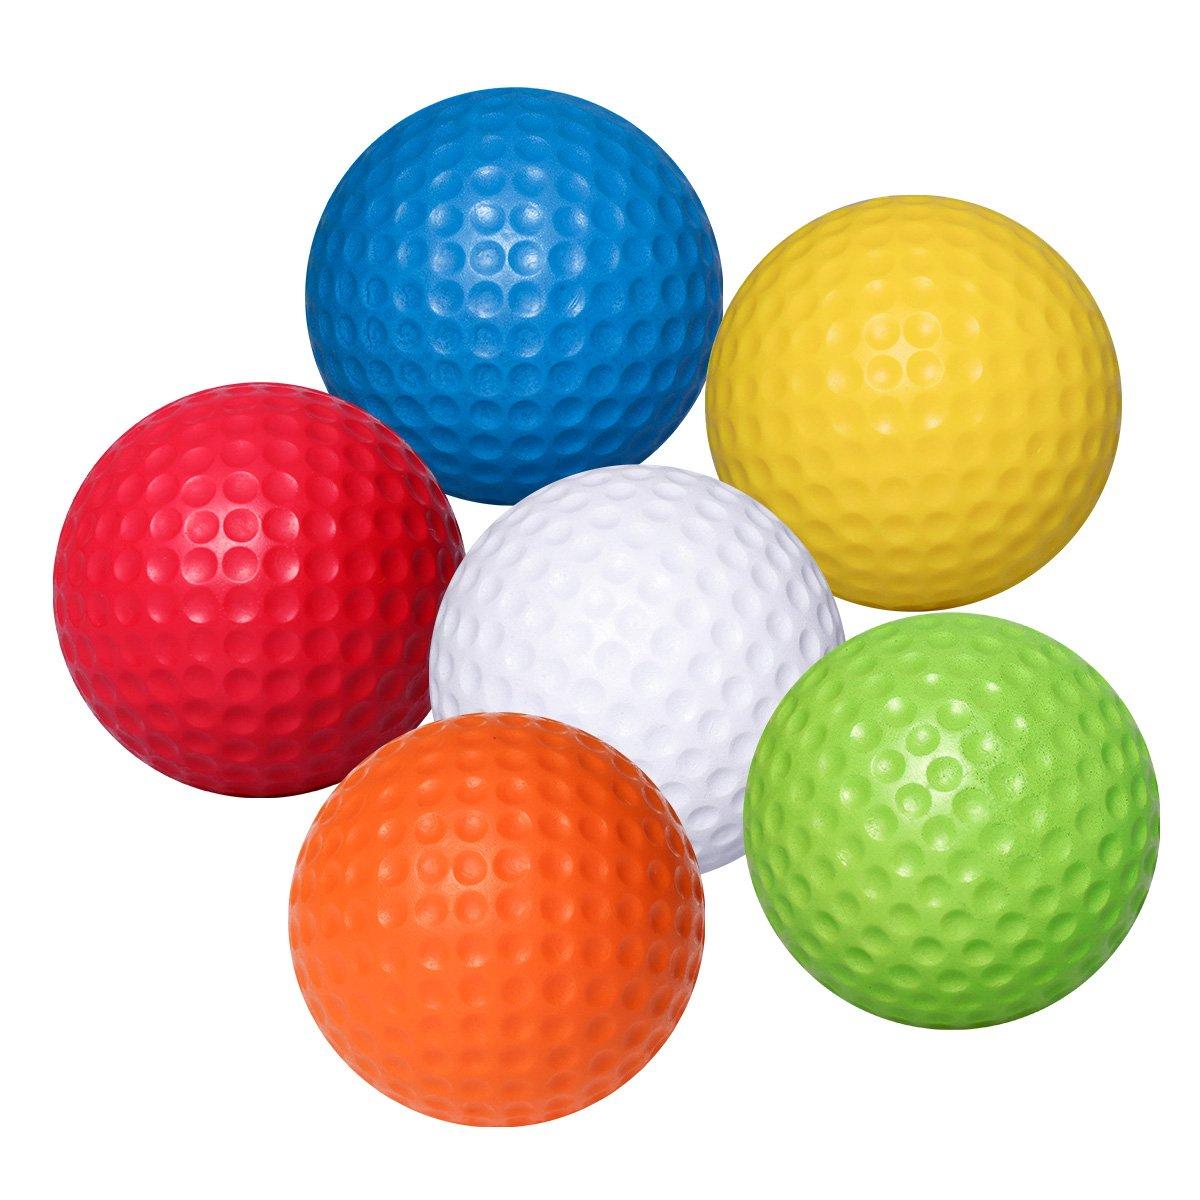 WINOMO 6pcs Soft Flexible Practice Golf Balls PU Golfballs Indoor Outdoor Training Golf Ball (White + Yellow + Blue + Red + Orange + Green)